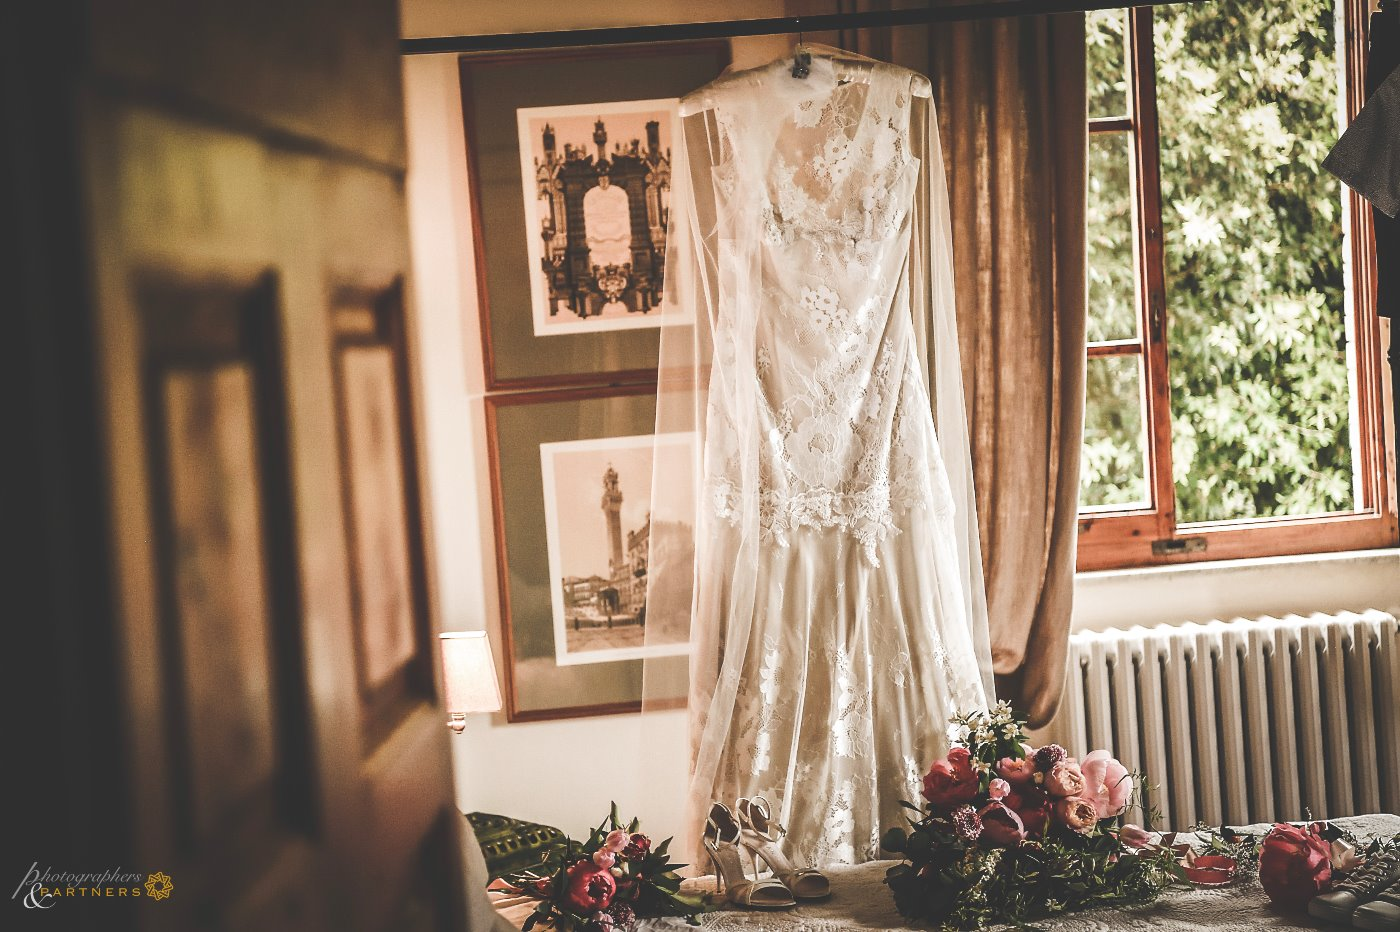 photos_weddings_castello_oliveto_04.jpg